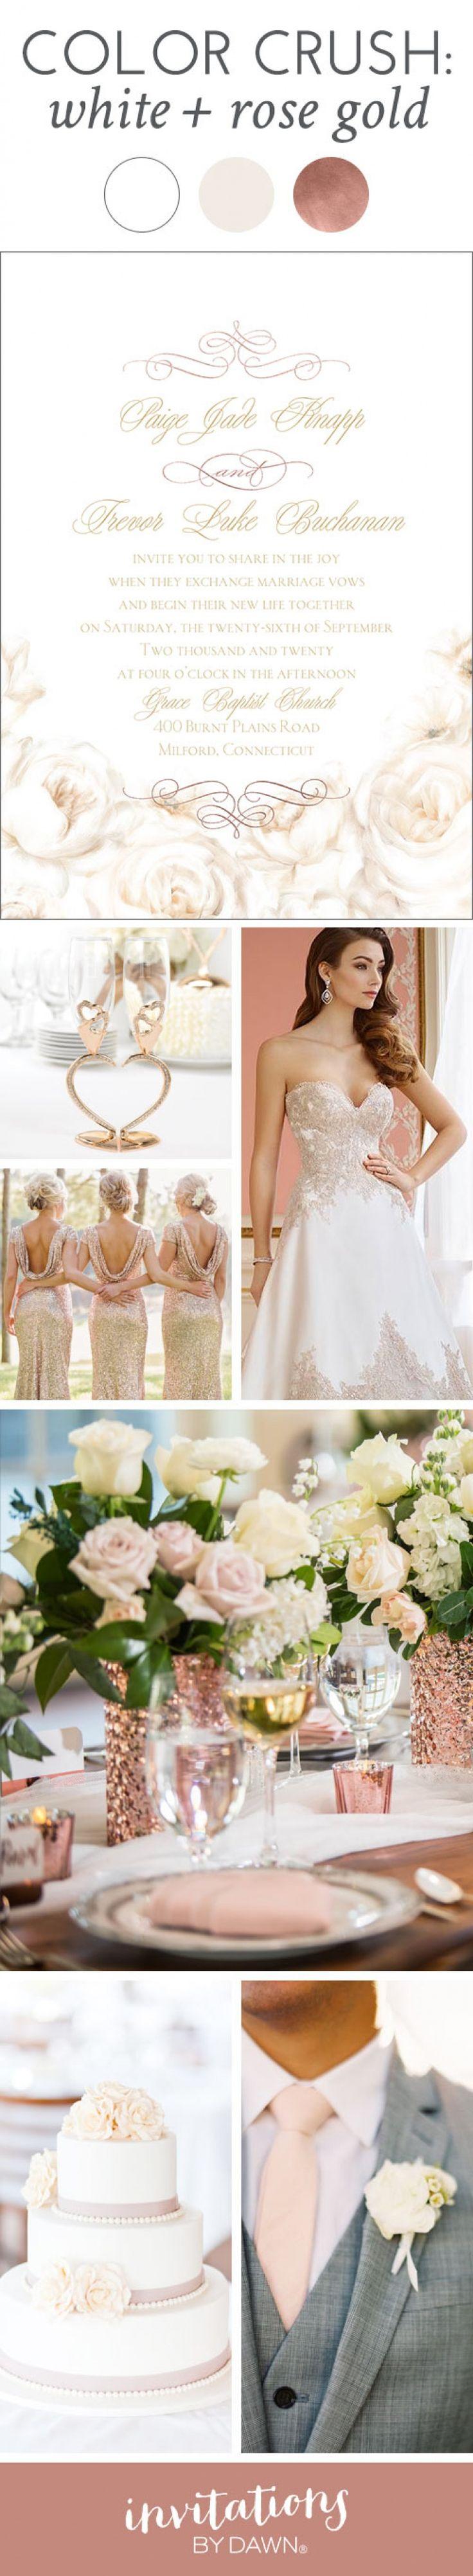 103 best Wedding themes images on Pinterest | Wedding inspiration ...